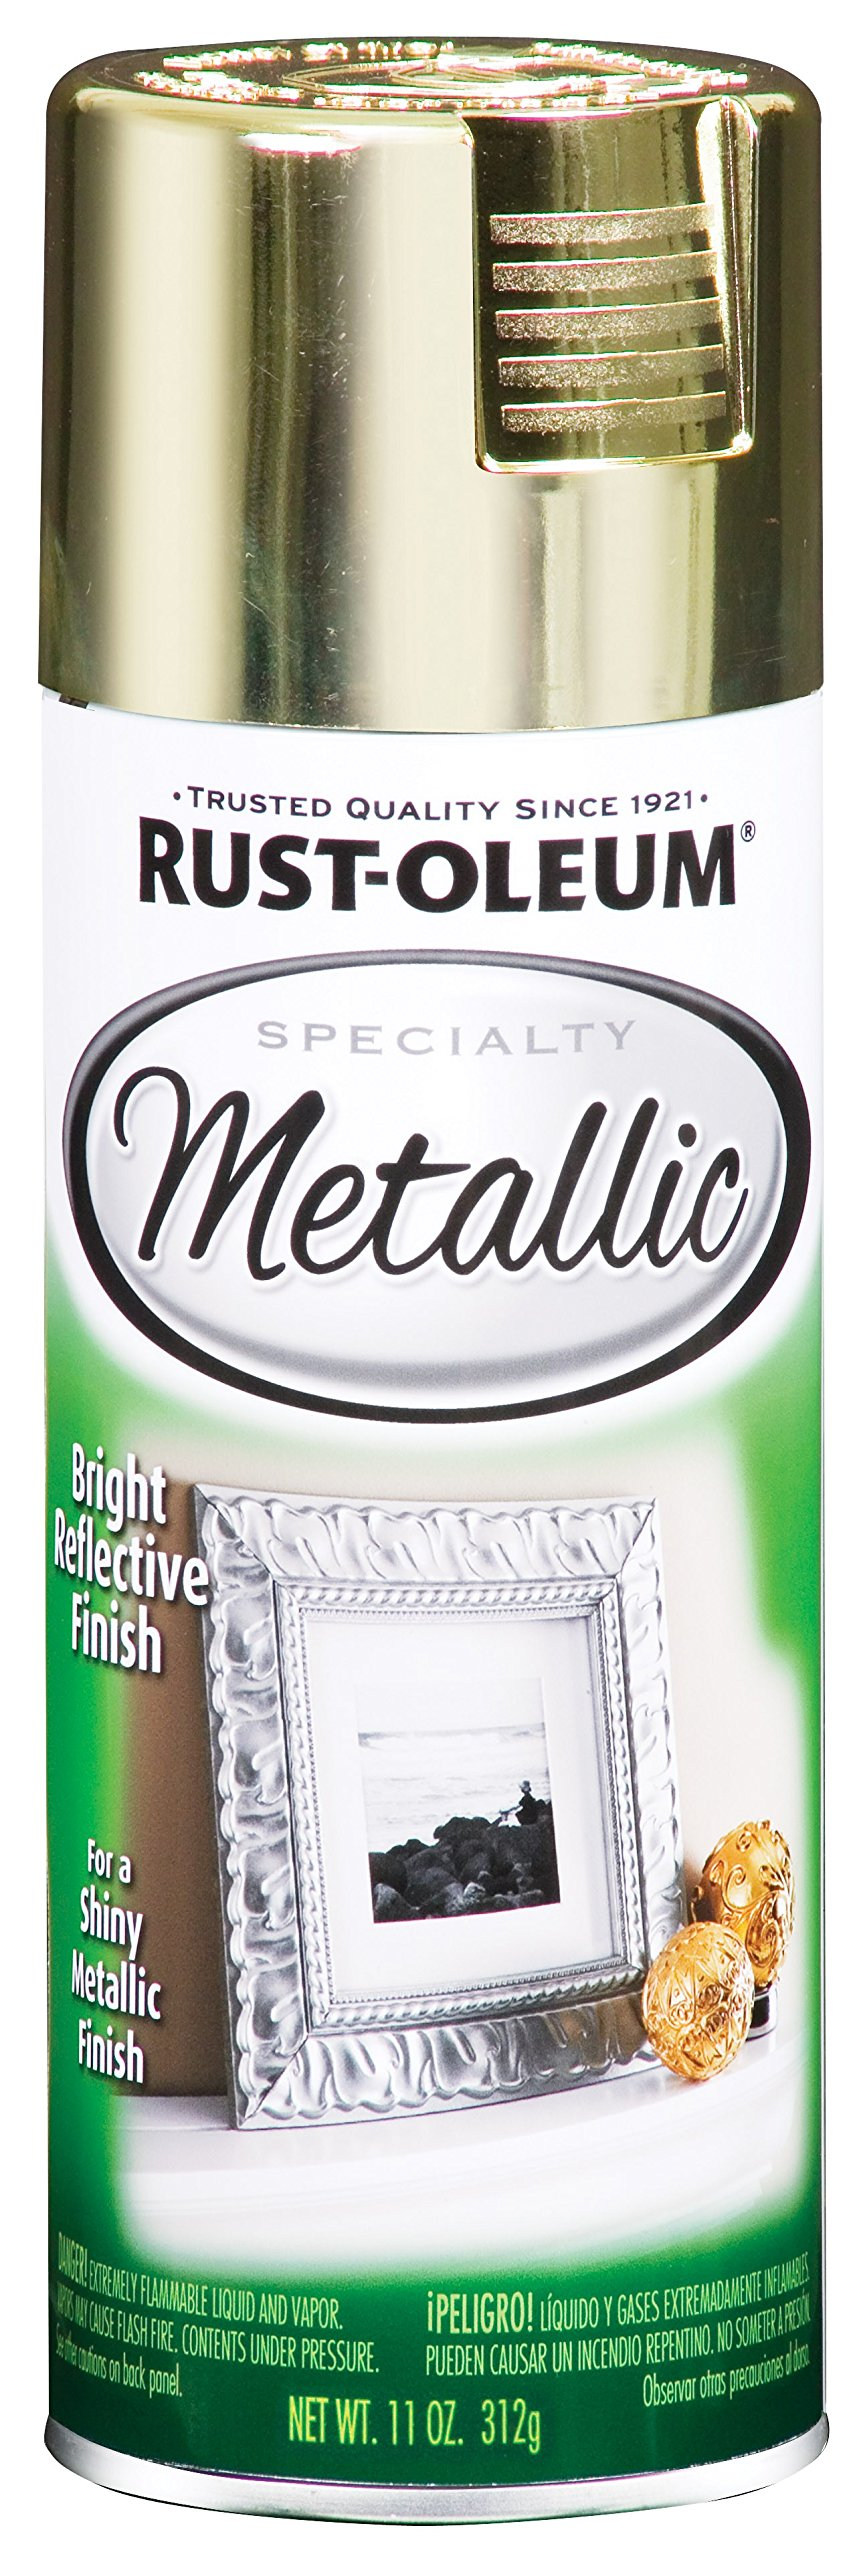 Rust-Oleum 1936830-6 PK Specialty Metallic 1936830 Spray Paint 11 oz, Brass, 6-Pack, 6 Pack